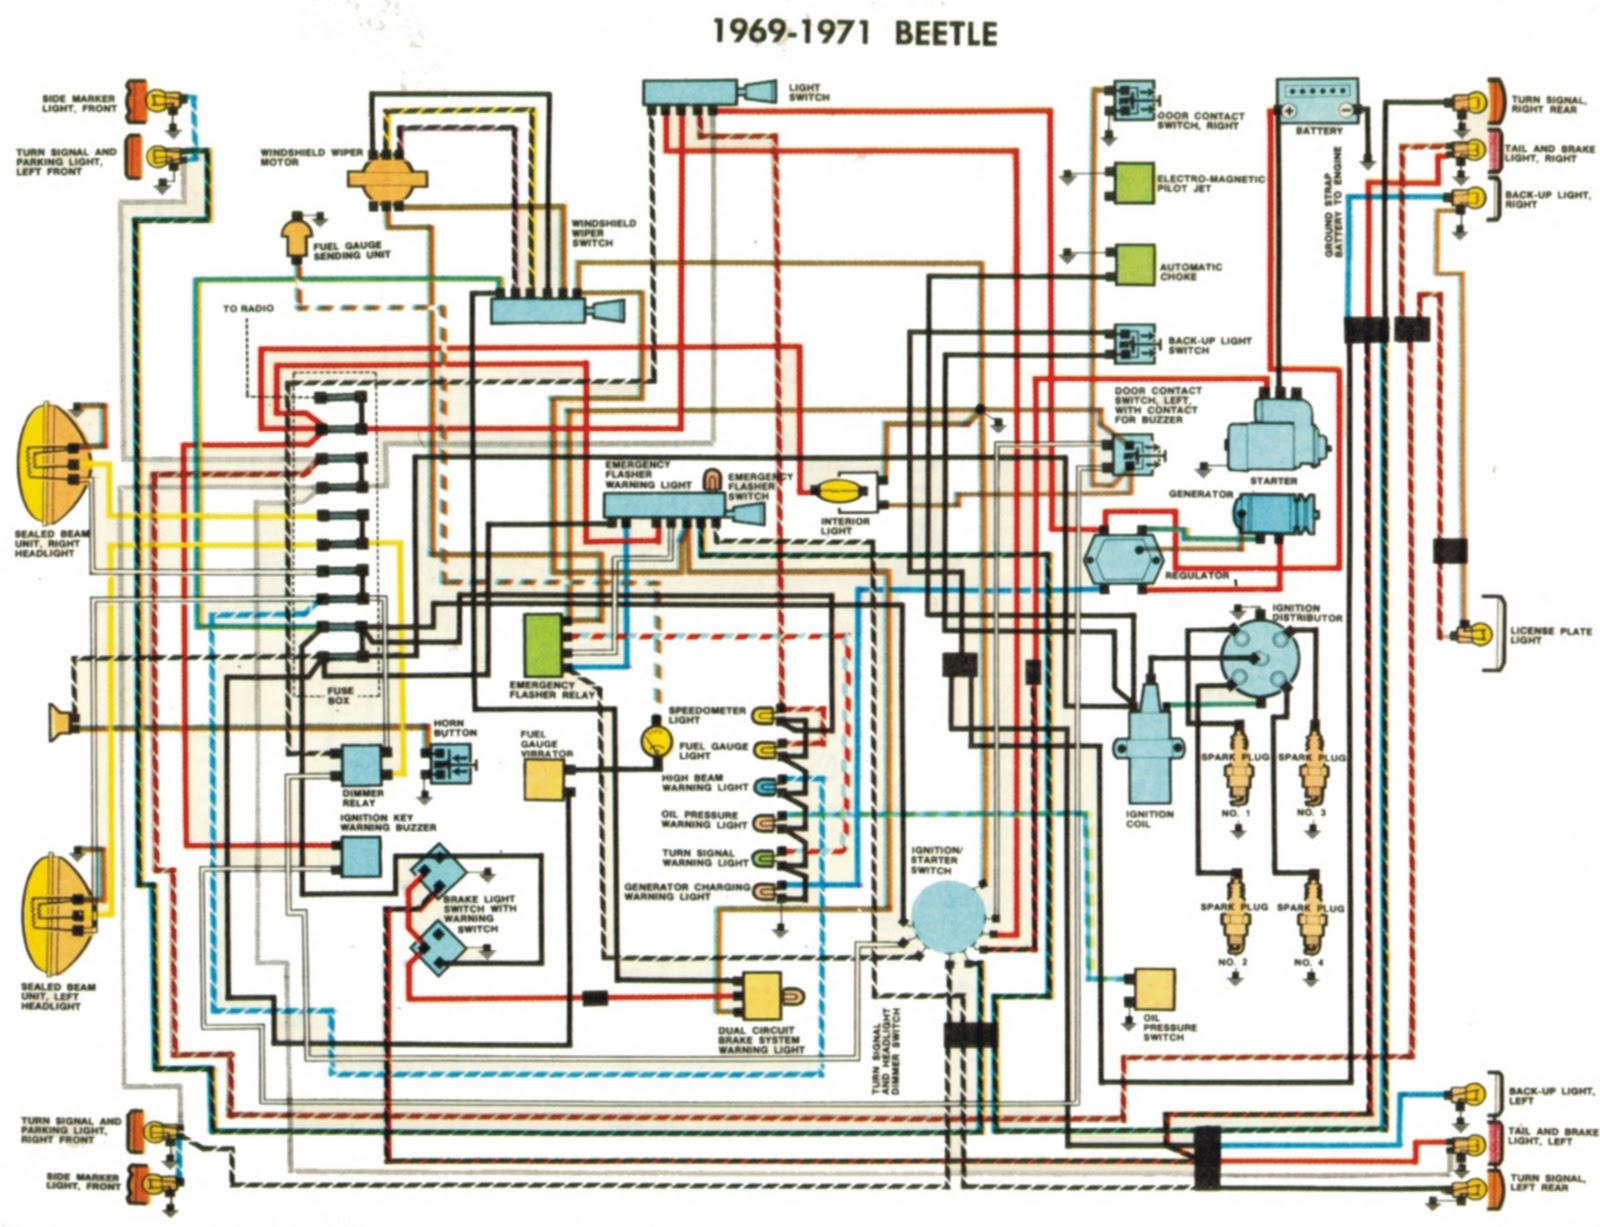 Pleasant Vw Thing Engine Diagram Wiring Library Wiring Cloud Rometaidewilluminateatxorg